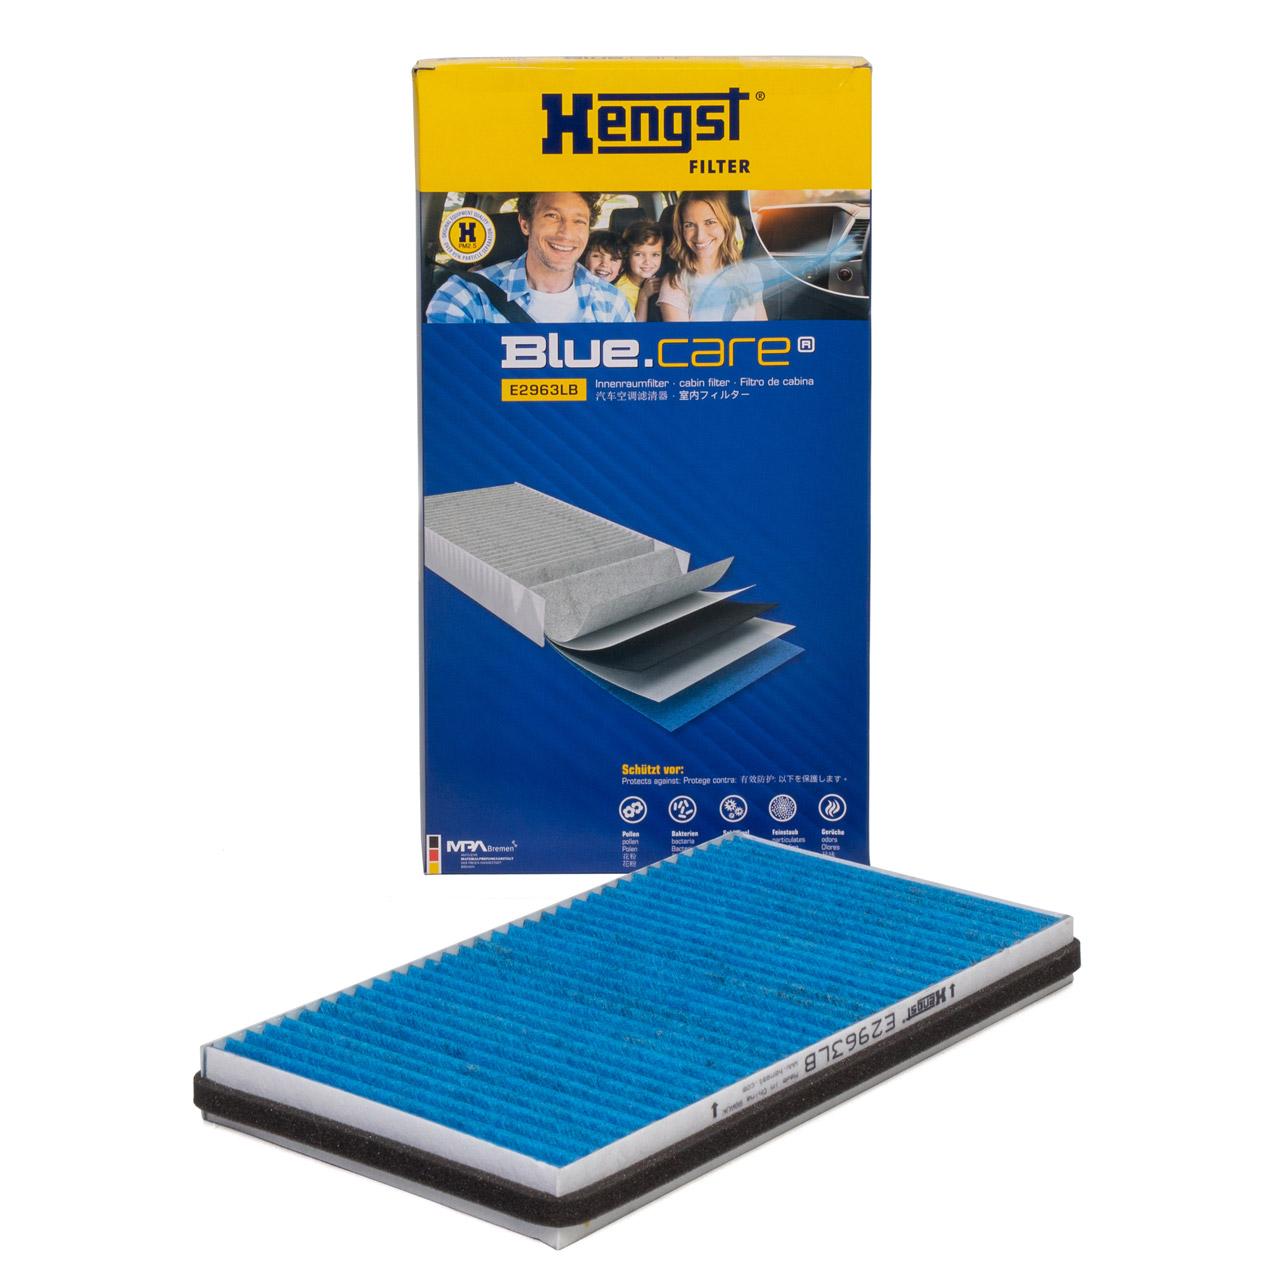 HENGST E2963LB BLUE CARE Innenraumfilter ANTIBAKTERIELL für BMW E60 E61 E63 E64